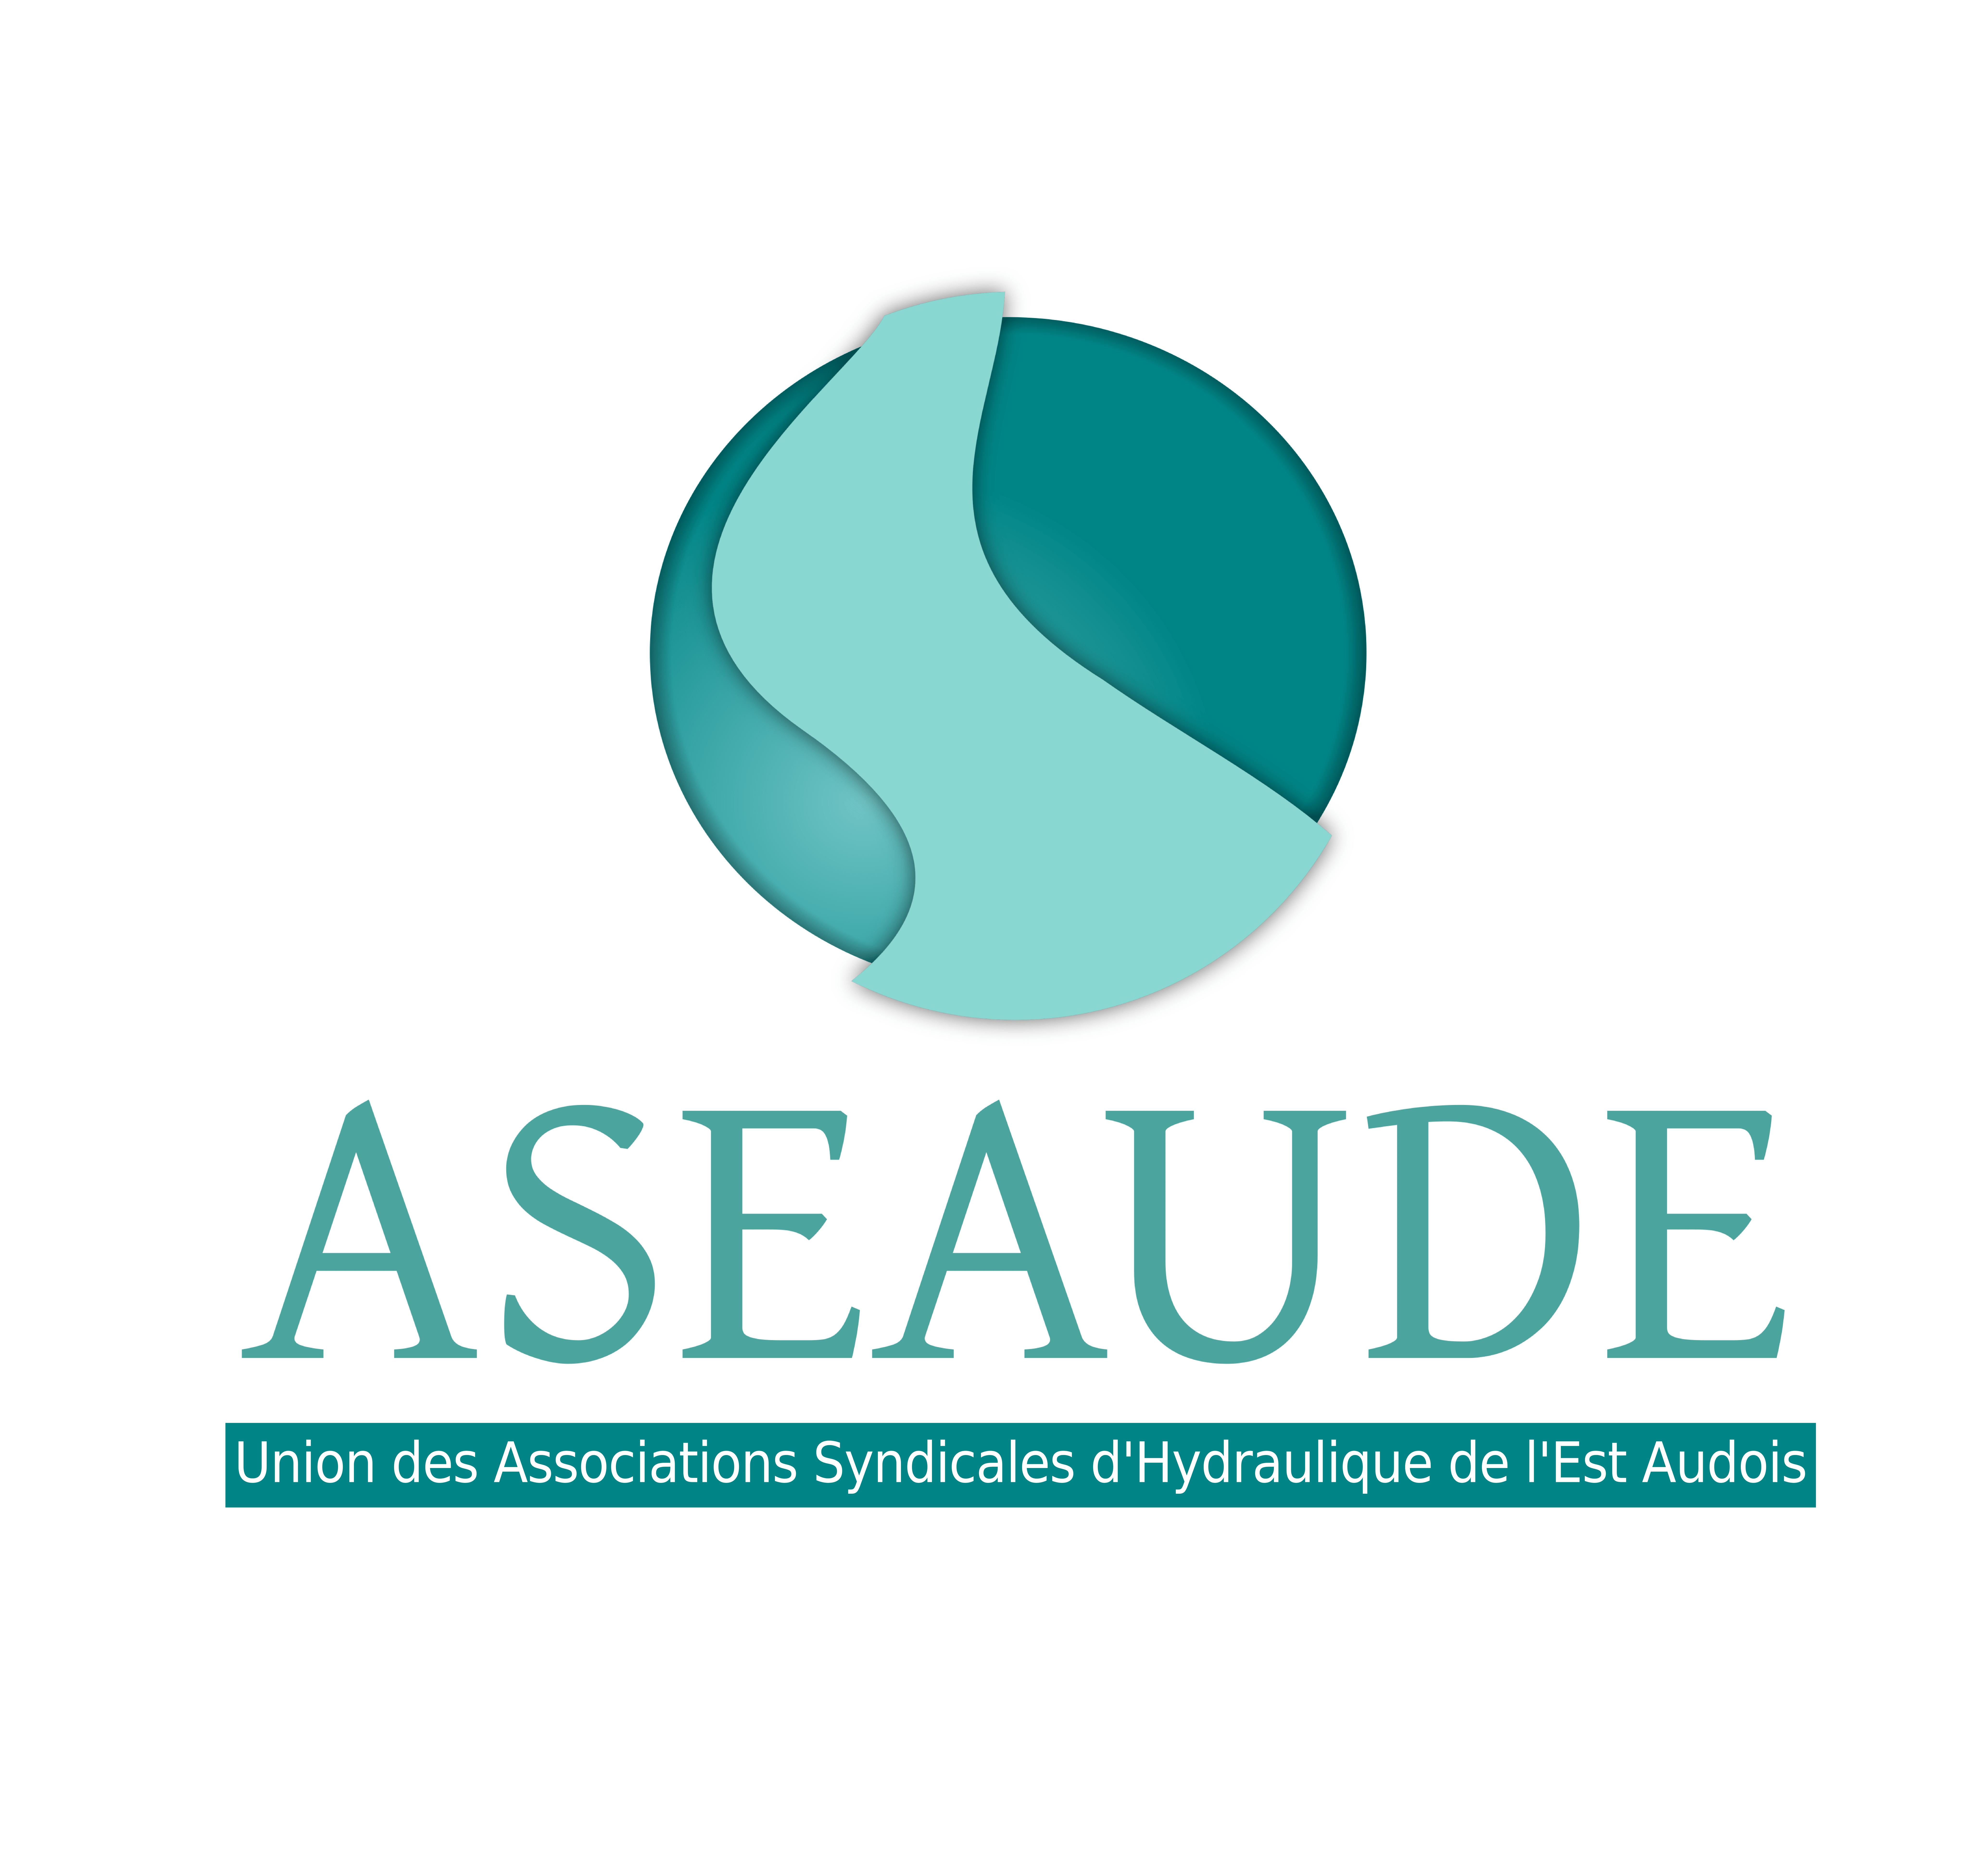 ASEAUDE